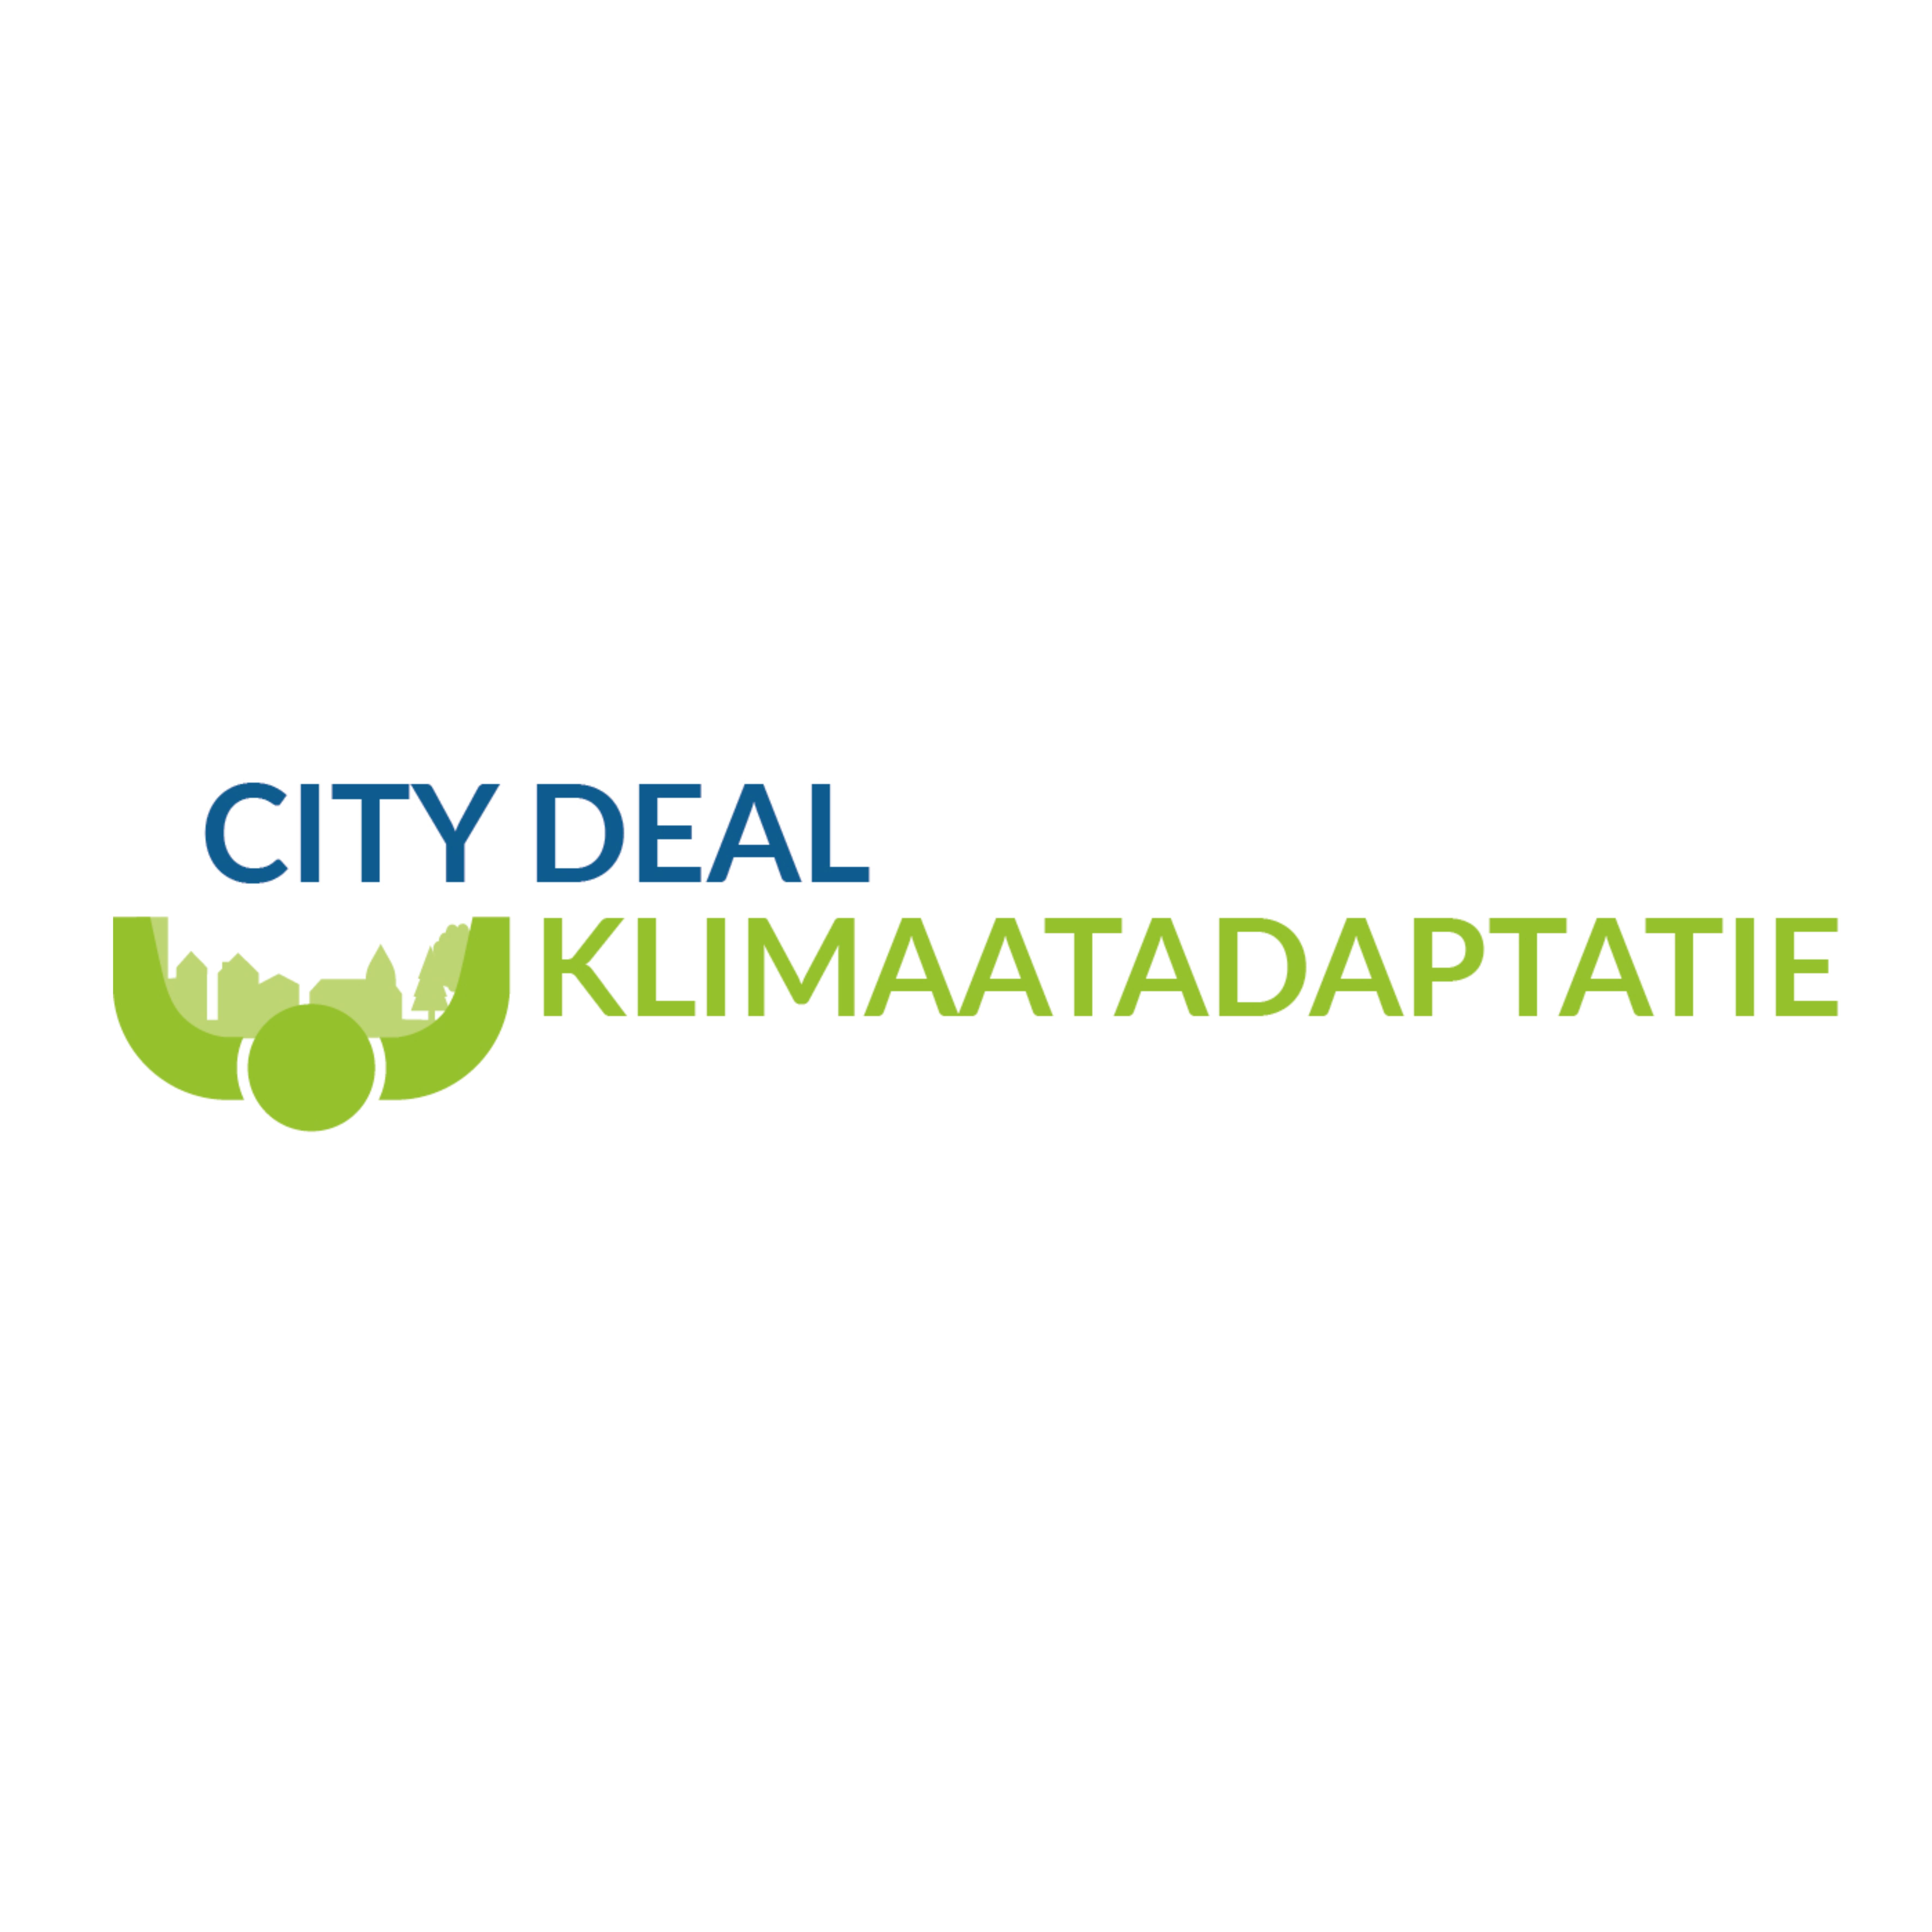 Eindrapportage City Deal Klimaatadaptatie